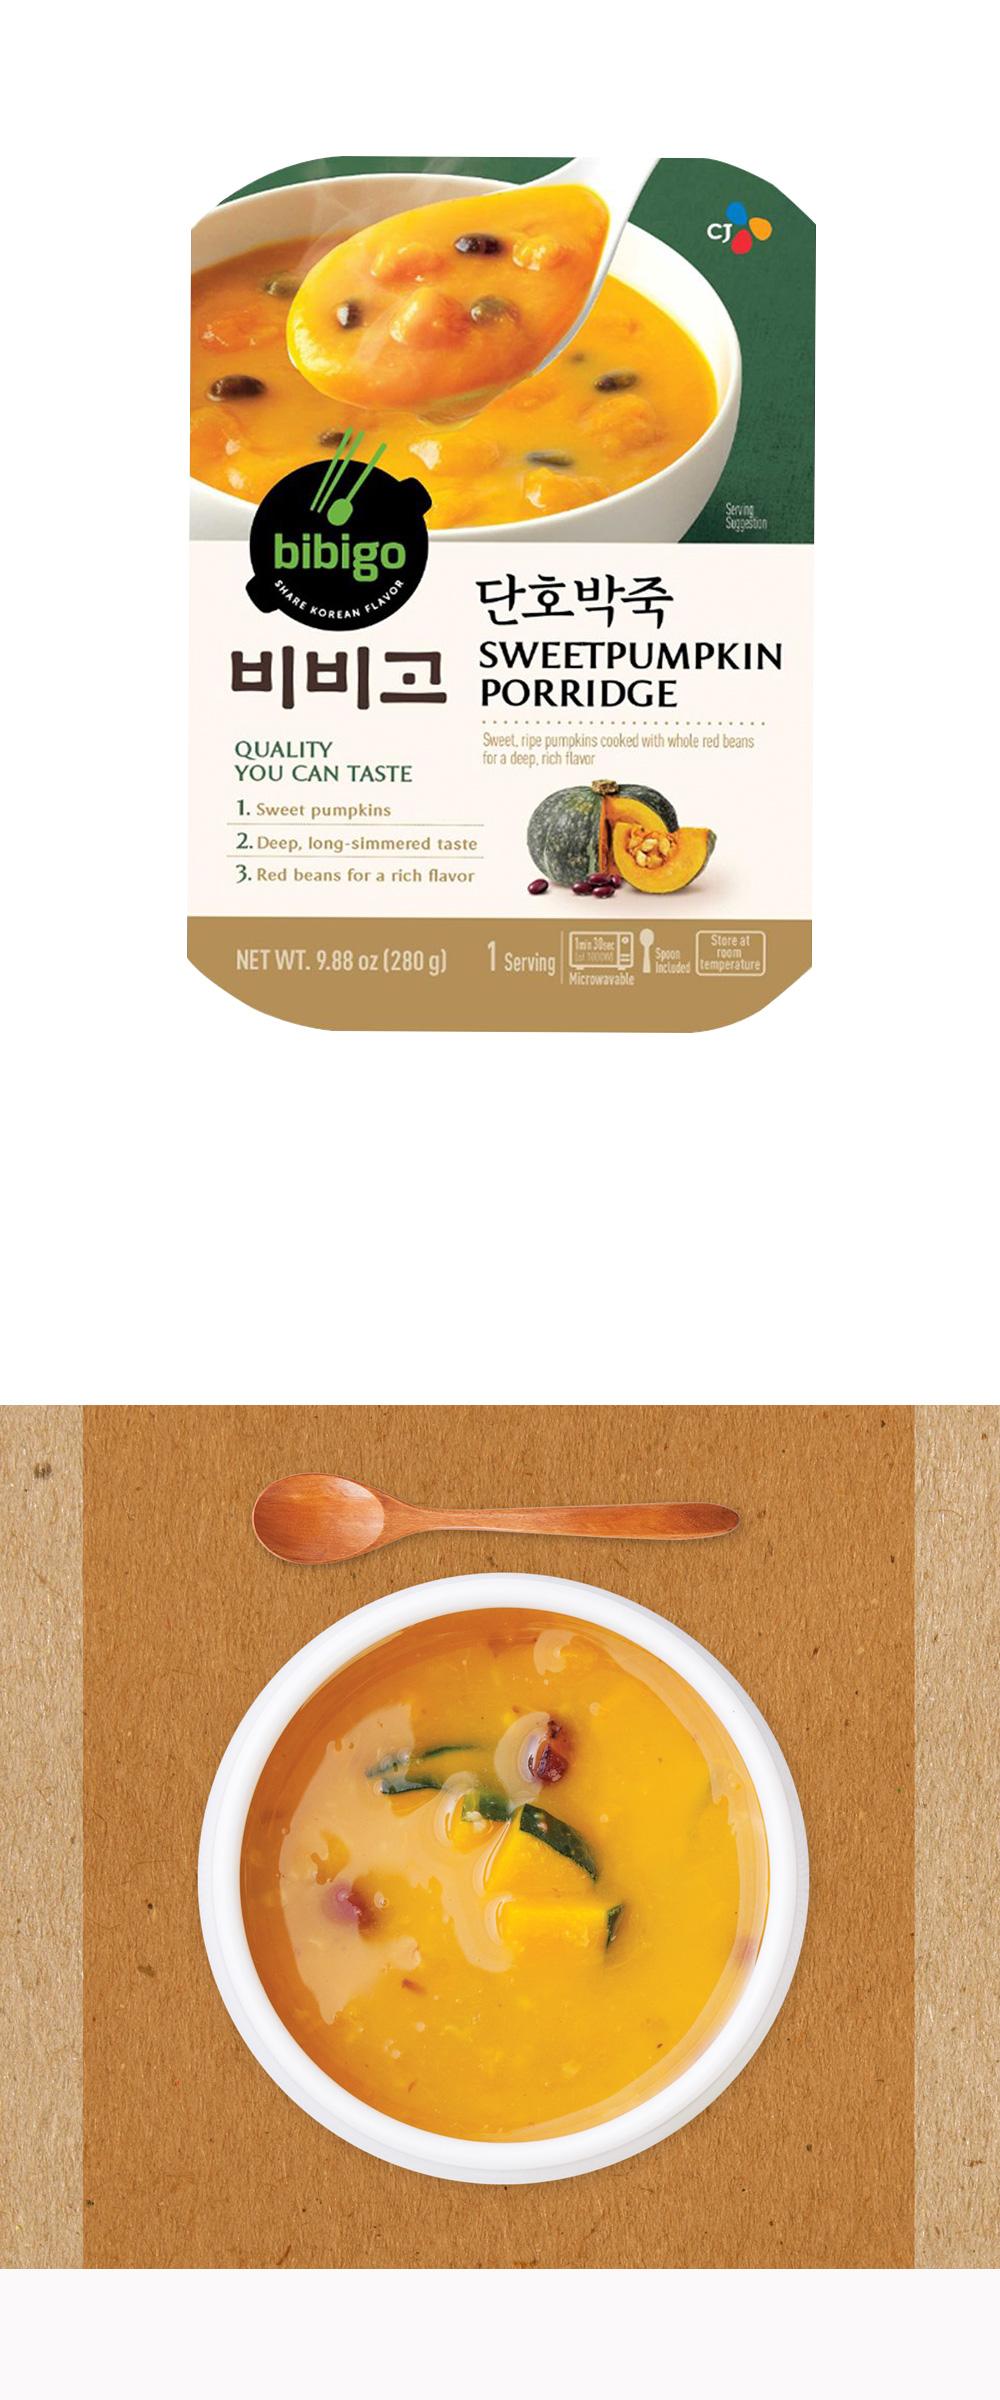 Bibigo Sweet Pumpkin Porridge with Red Bean 9.88oz(280g)